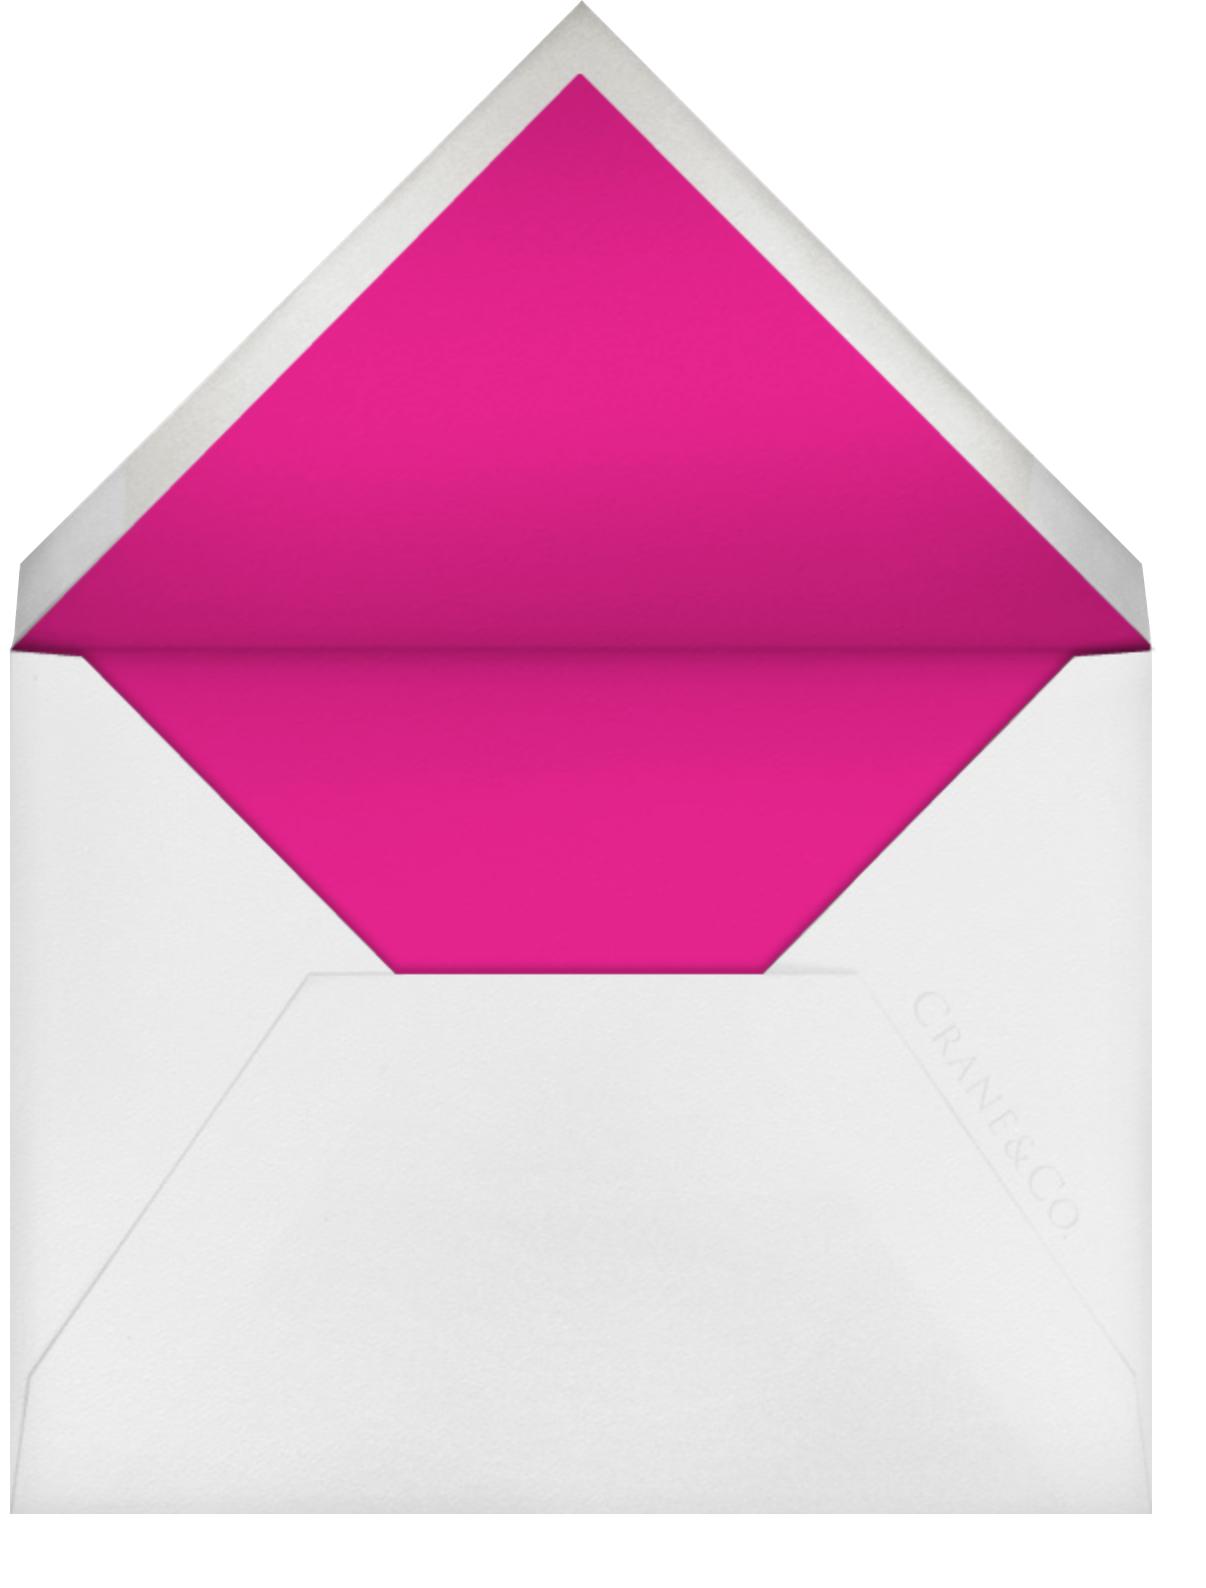 Silk Brocade I (Save the Date) - Raspberry - Oscar de la Renta - Save the date - envelope back